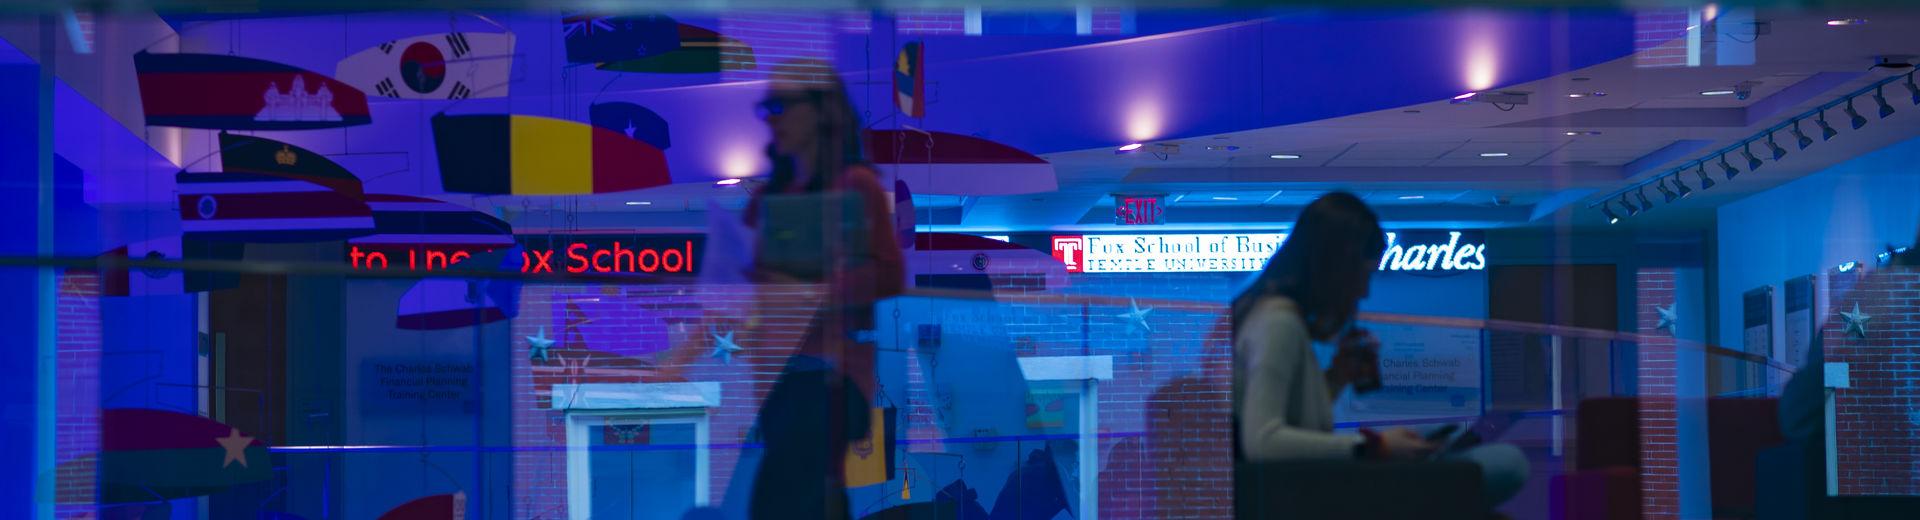 Fox School of Business students in blue-lit room